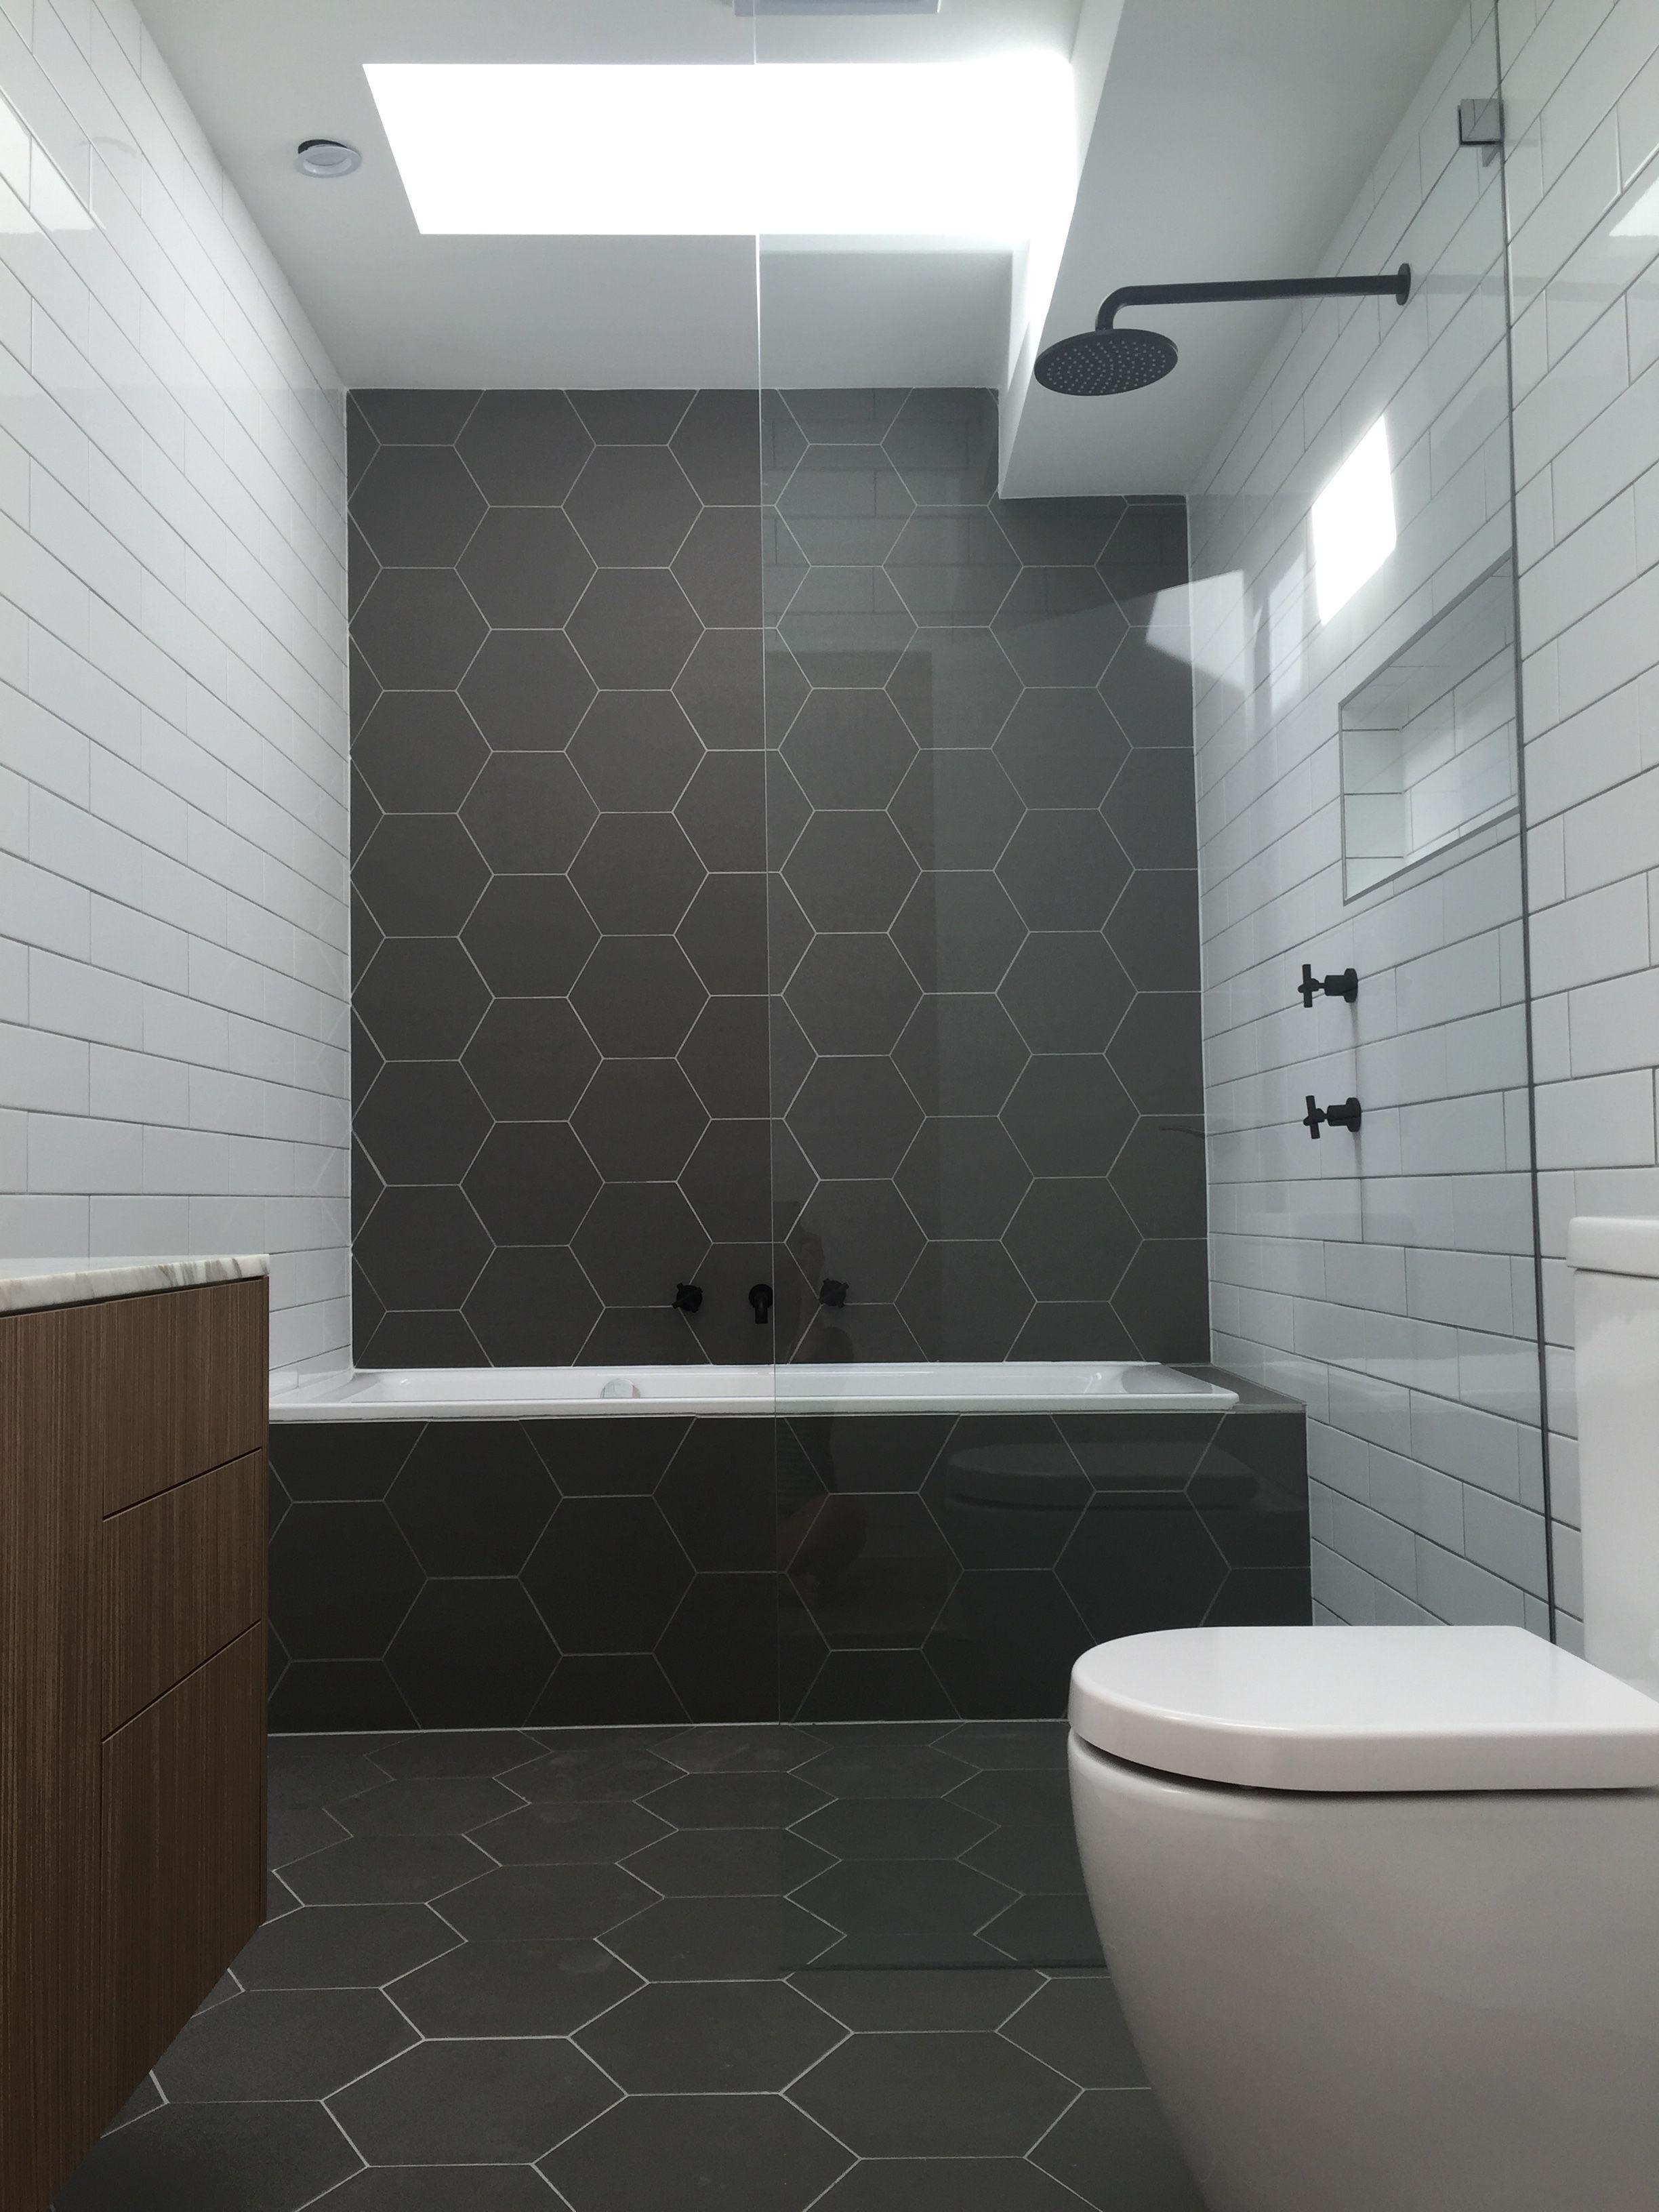 hexagonal tiles monochrome bathroom